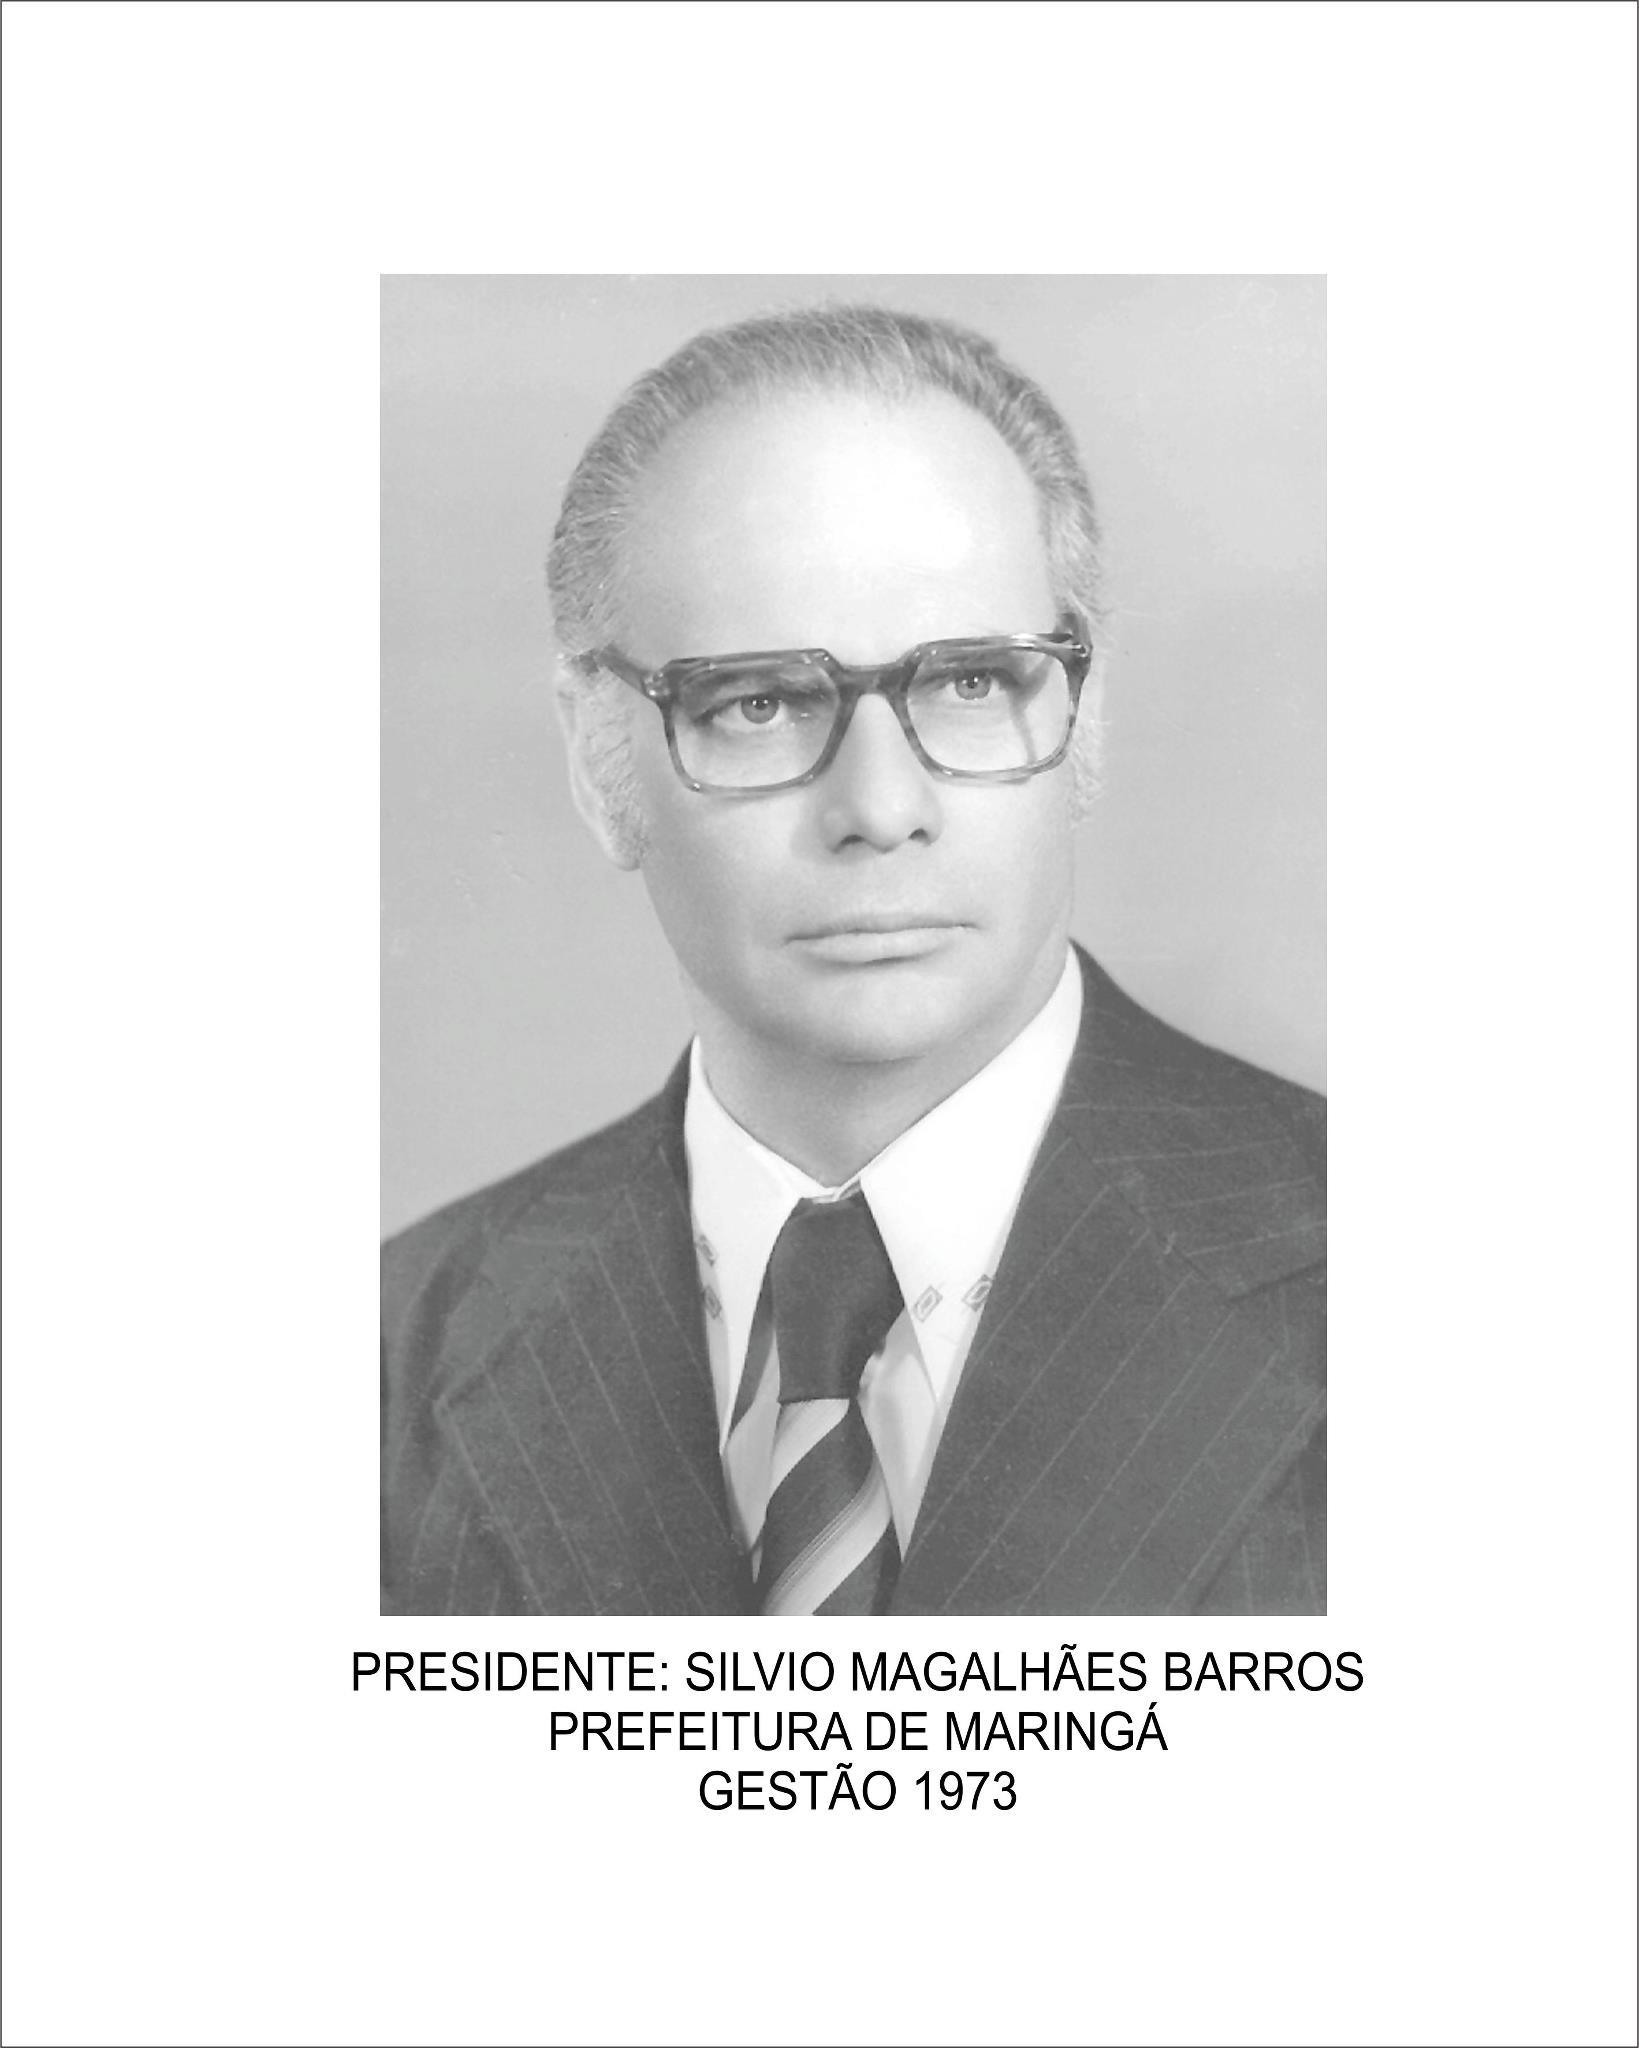 Sílvio Magalhães Barros